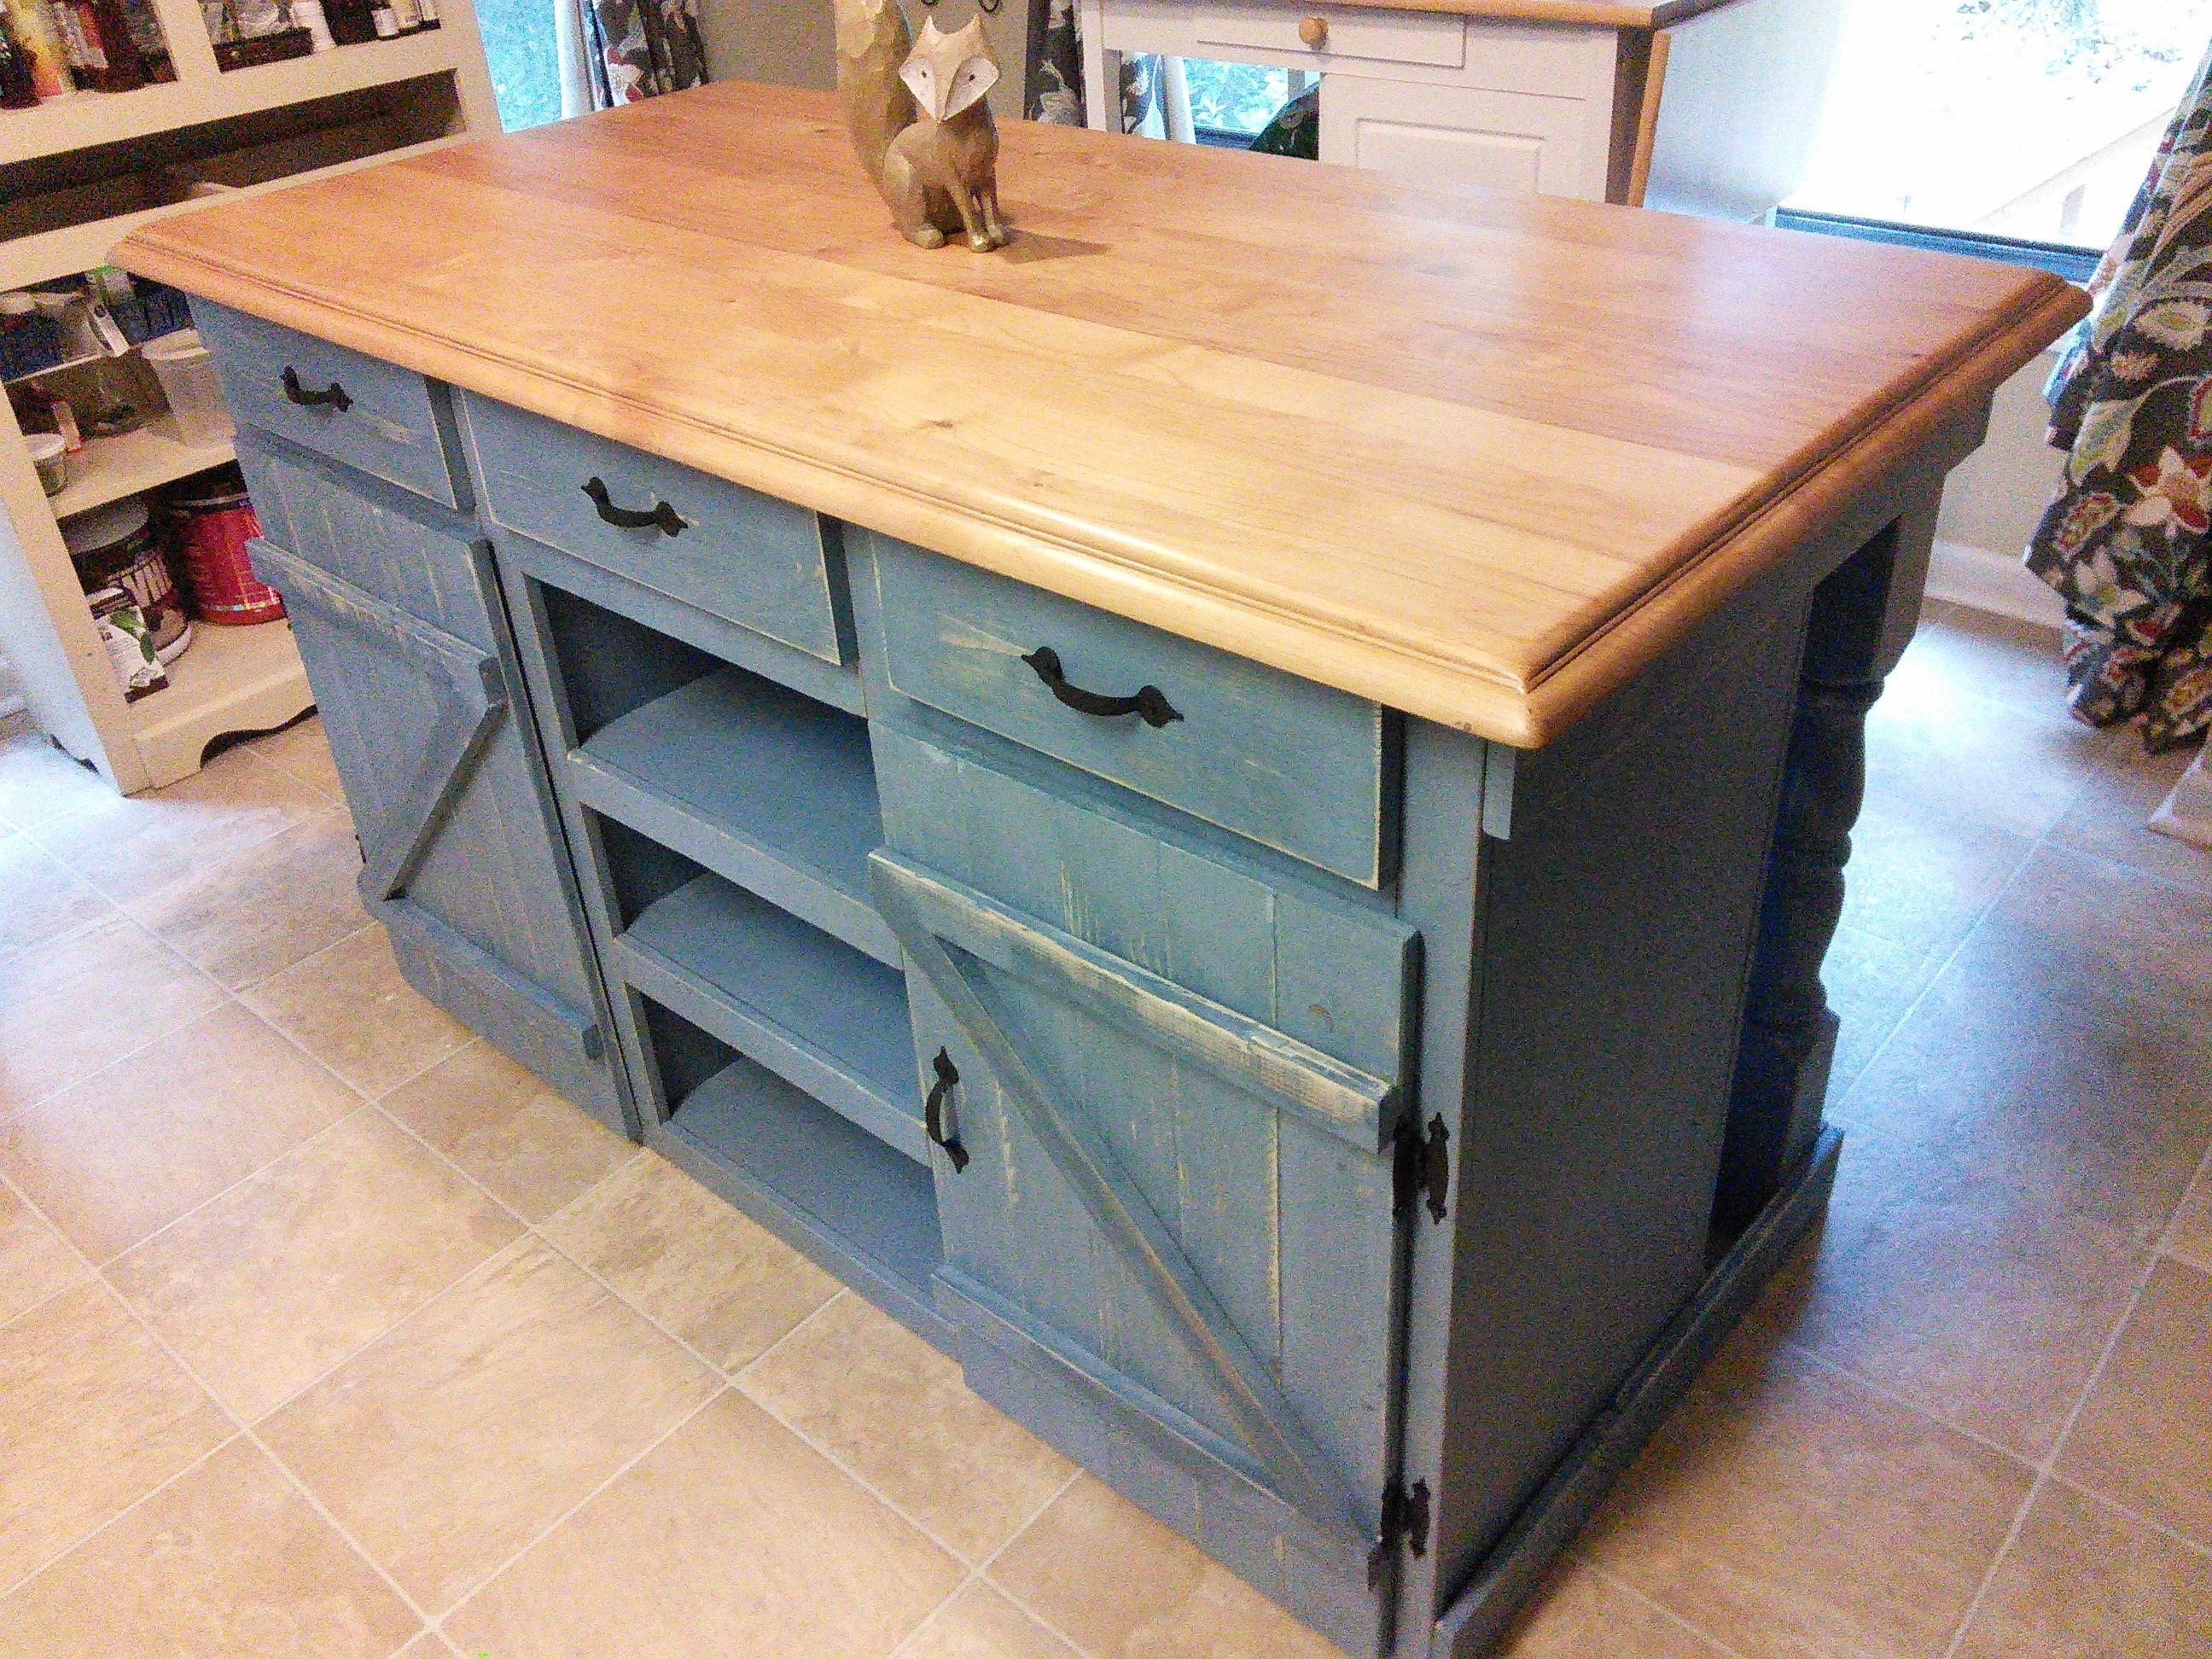 15 diy kitchen island woodworking plans in 2019 | house | pallet